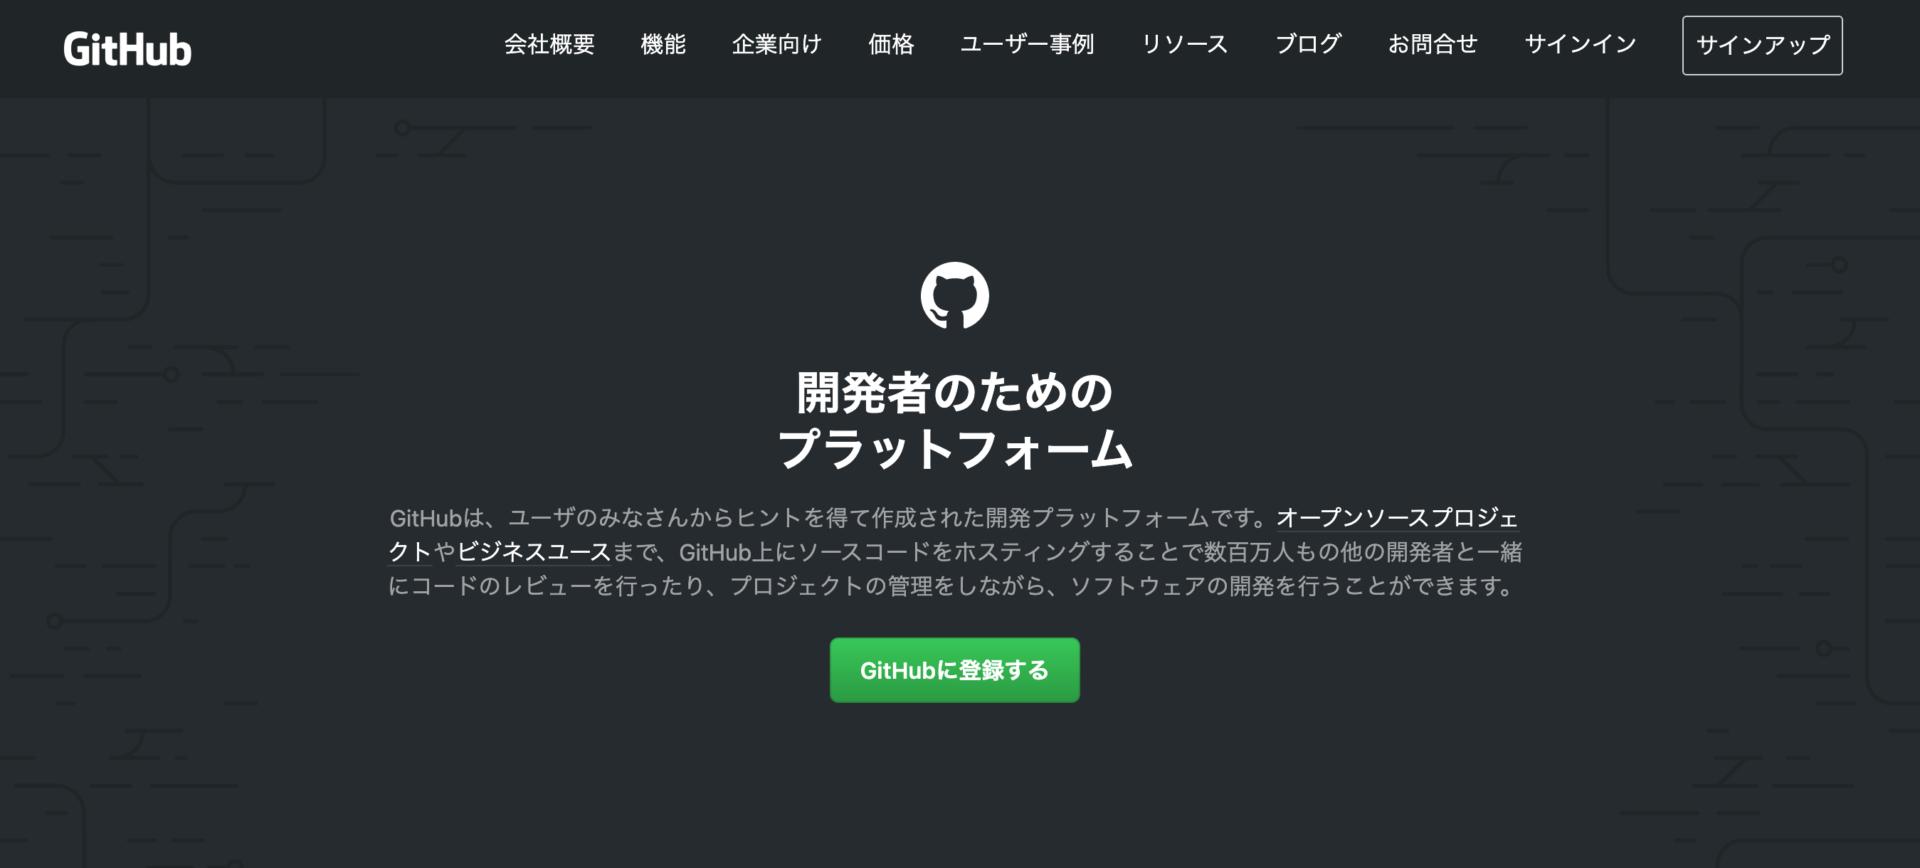 GitHubのWEBサイトのトップページ